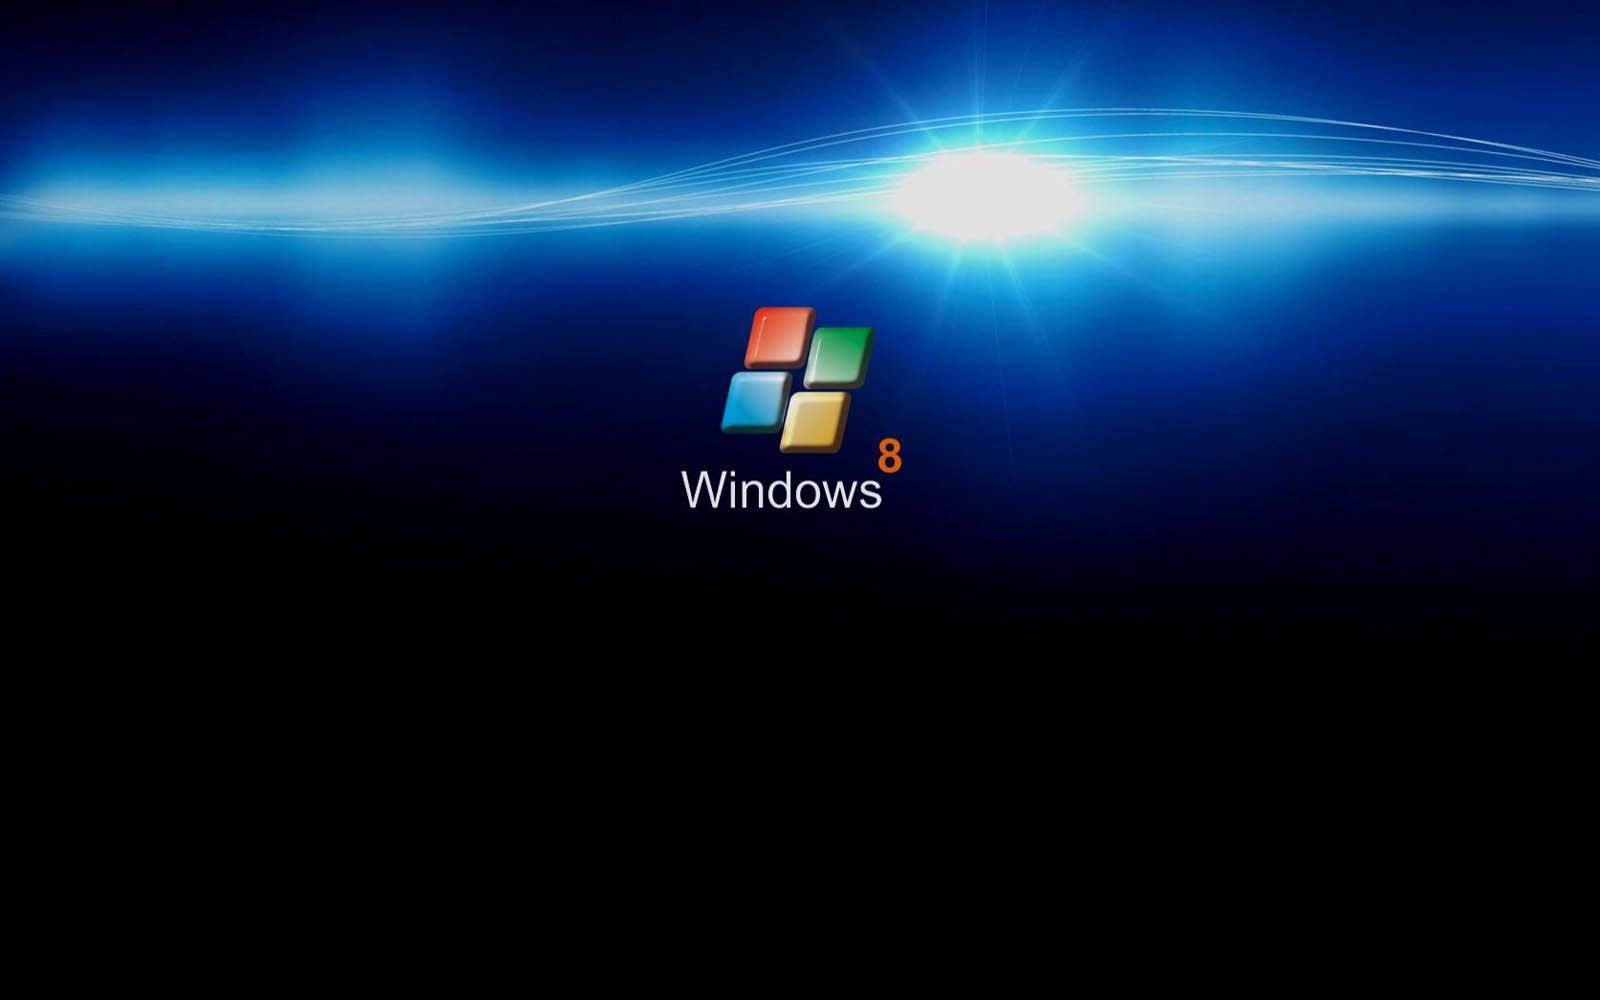 Free Live Wallpapers For Windows 8 WallpaperSafari